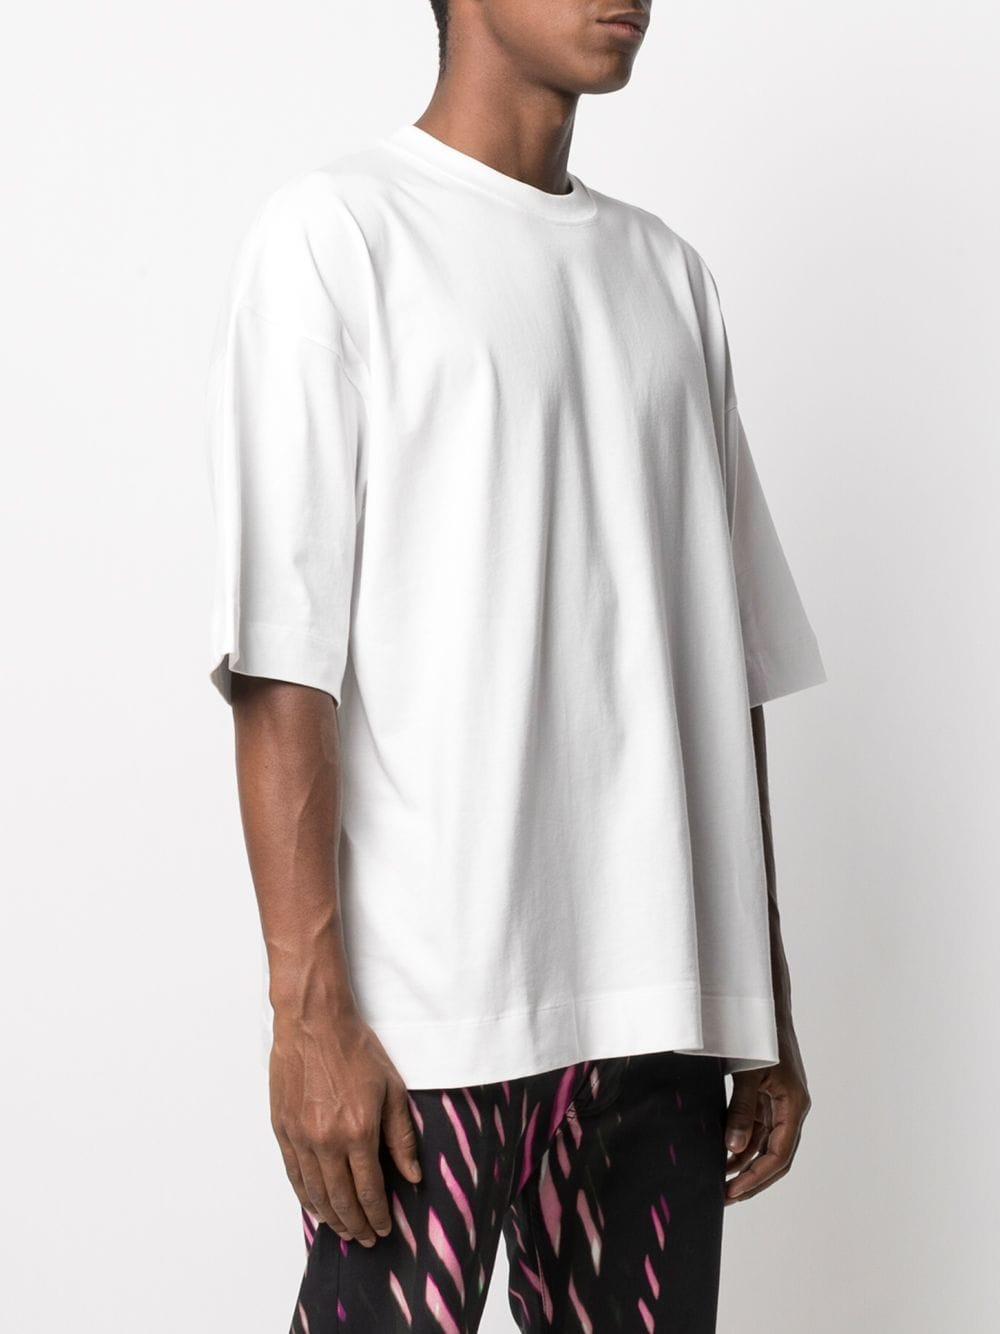 DRIES VAN NOTEN | T-shirts | HEN2603OFFWHITE